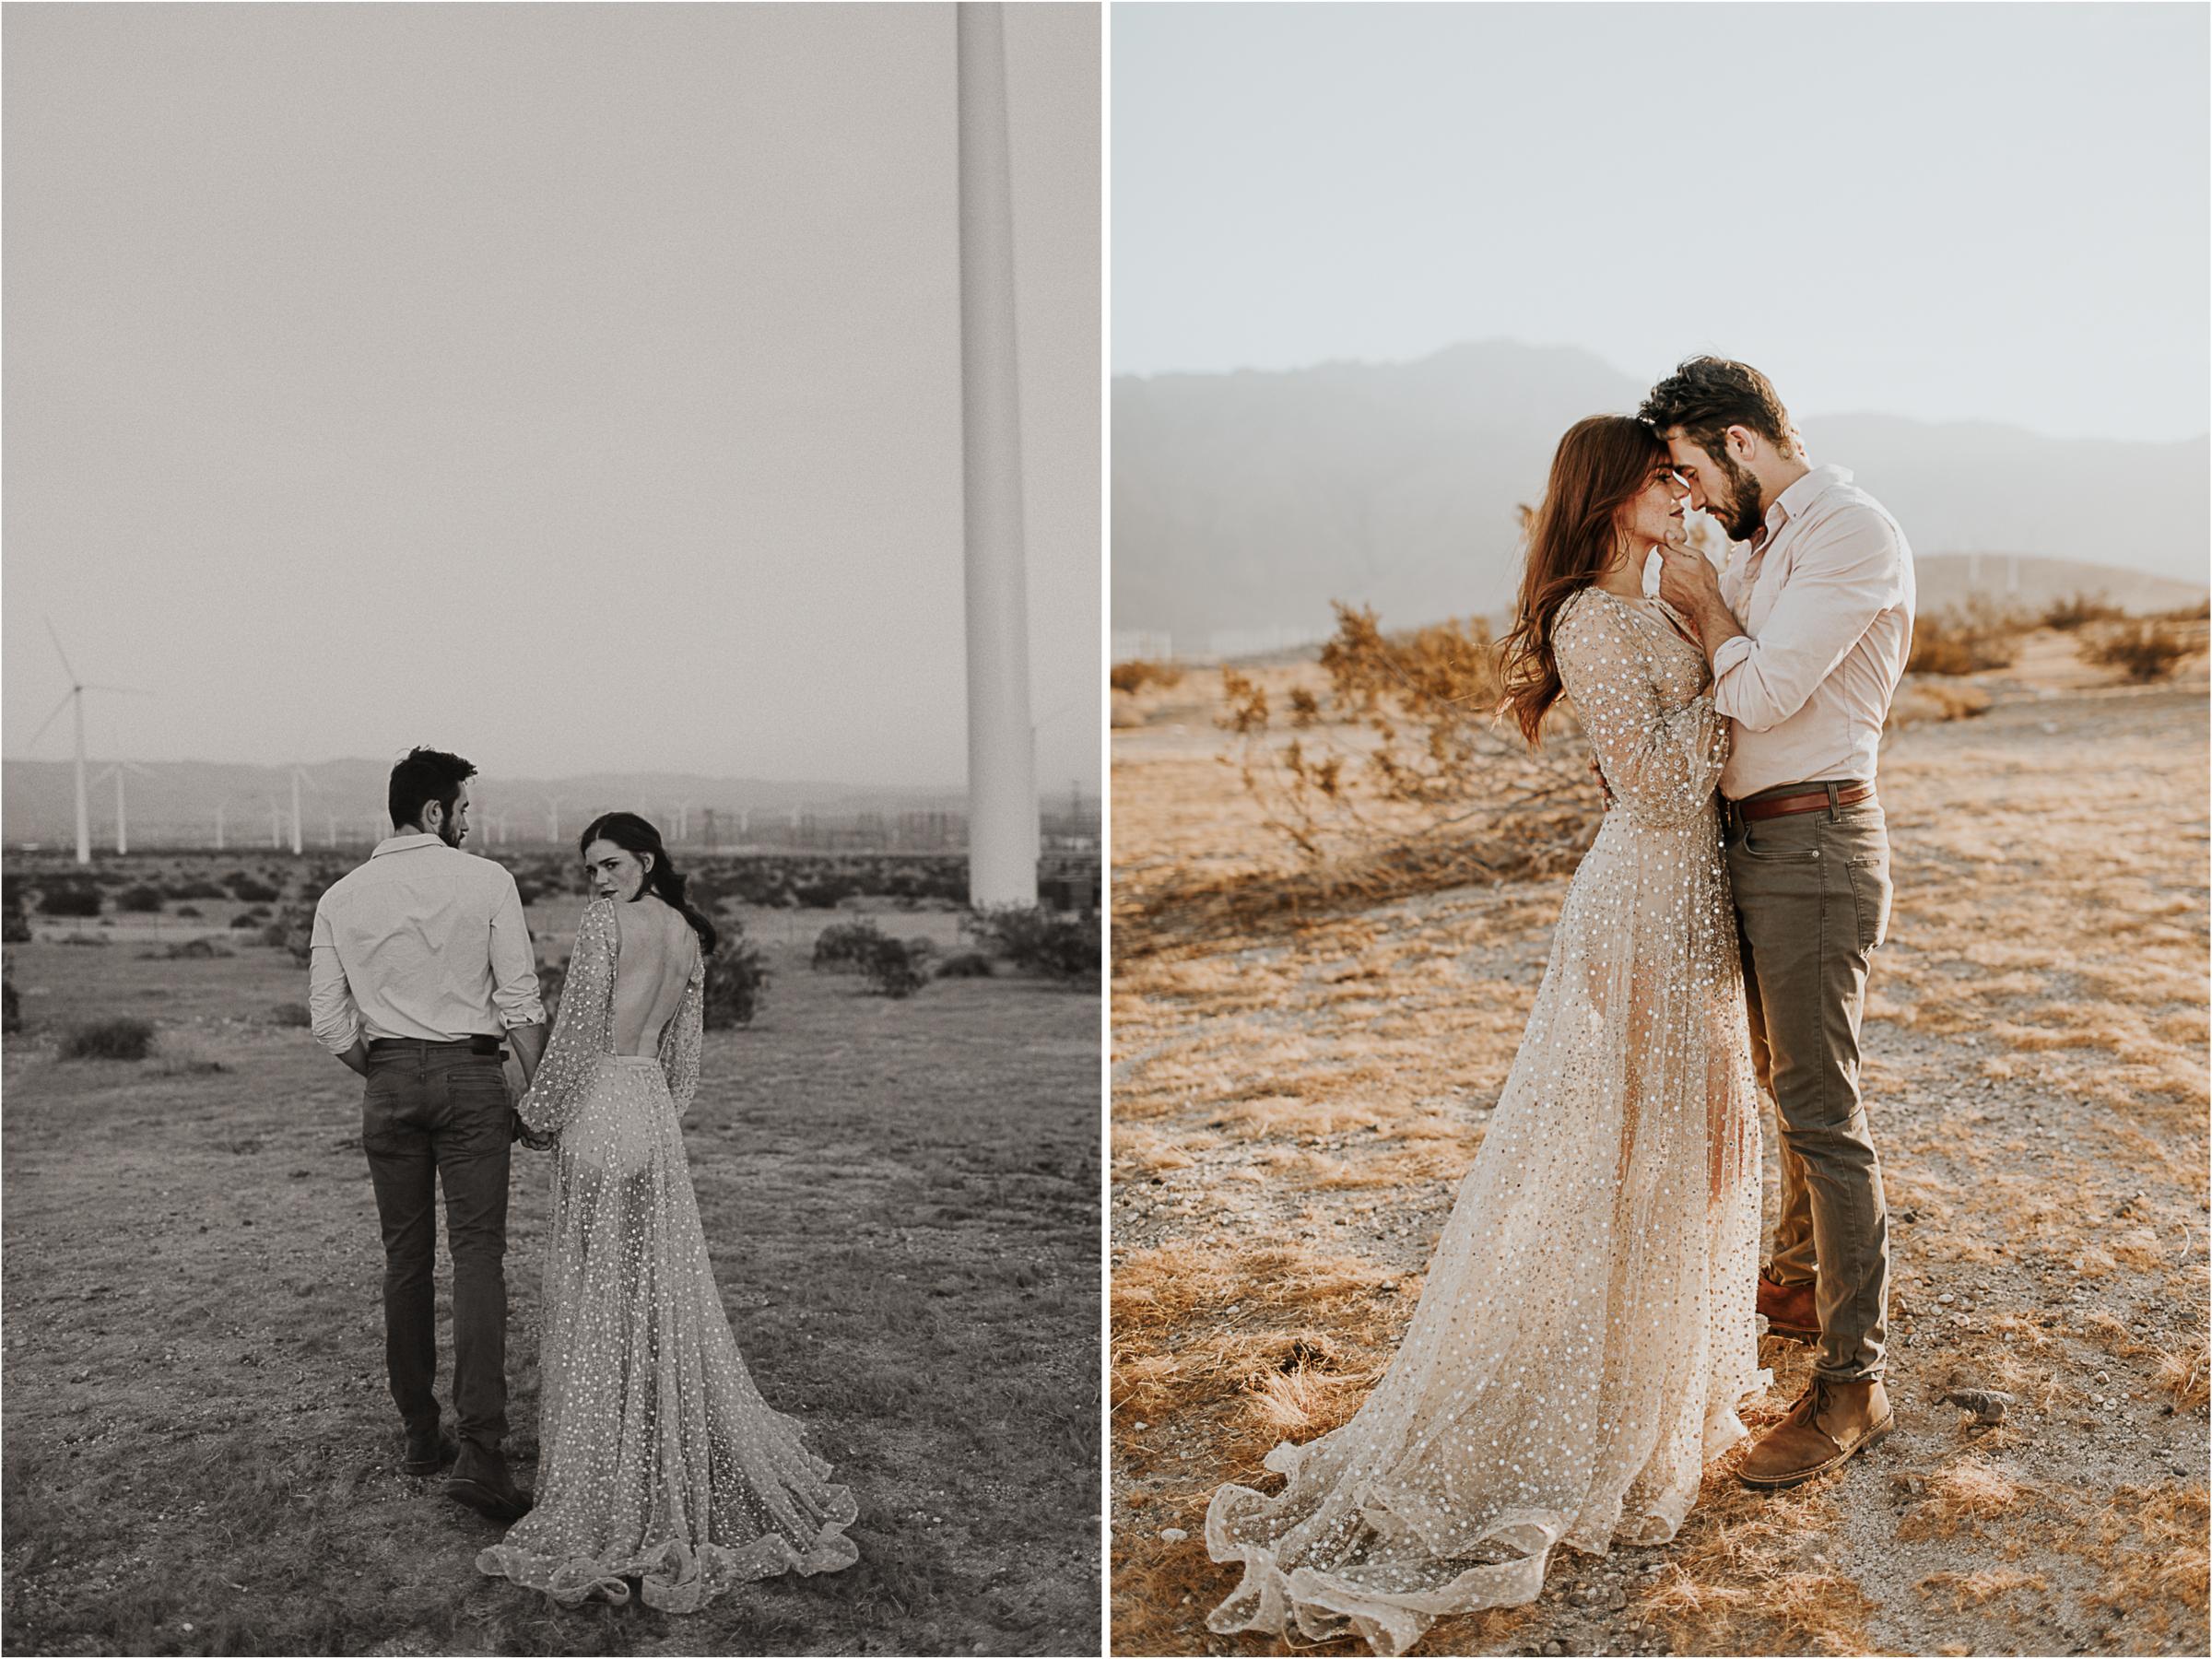 MelissaMarshall_Thrive Wildly Photography Workshop_24.jpg